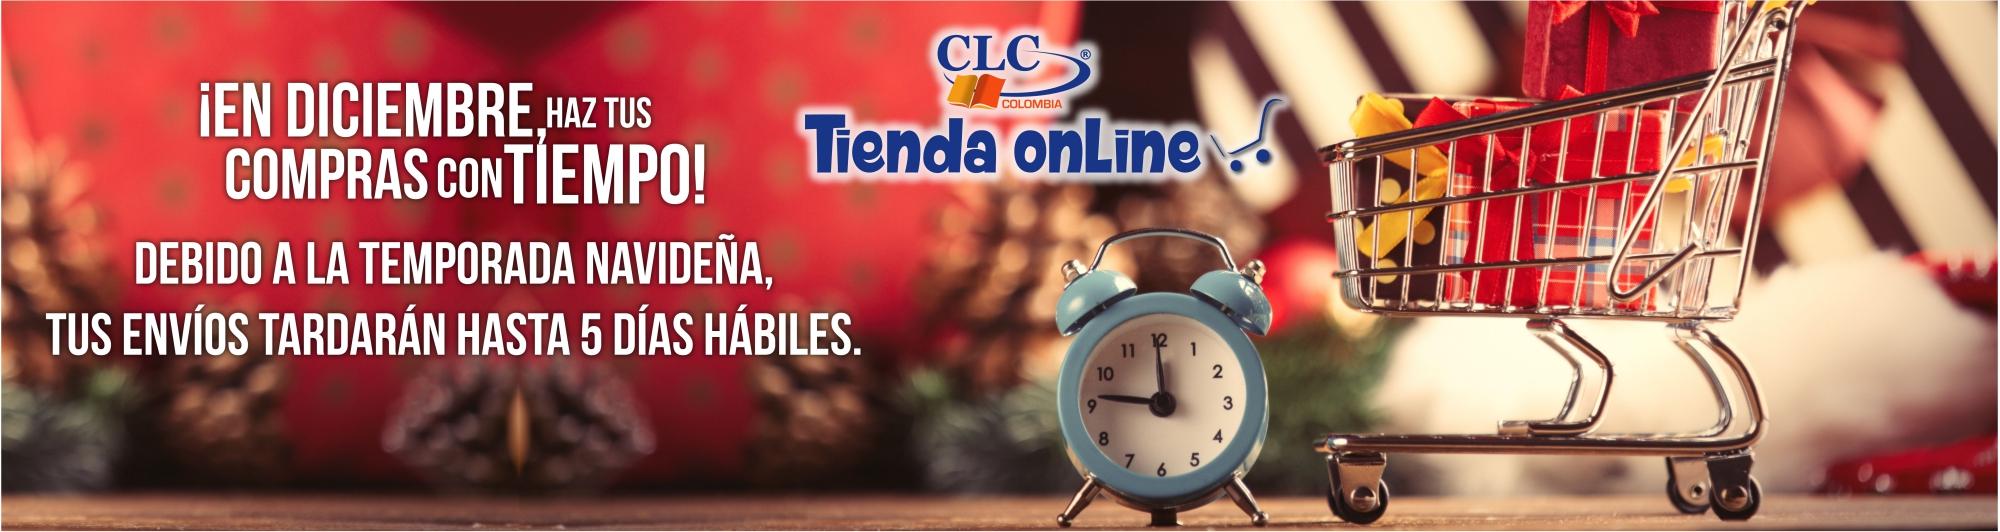 a bannertienda online plantilla-02